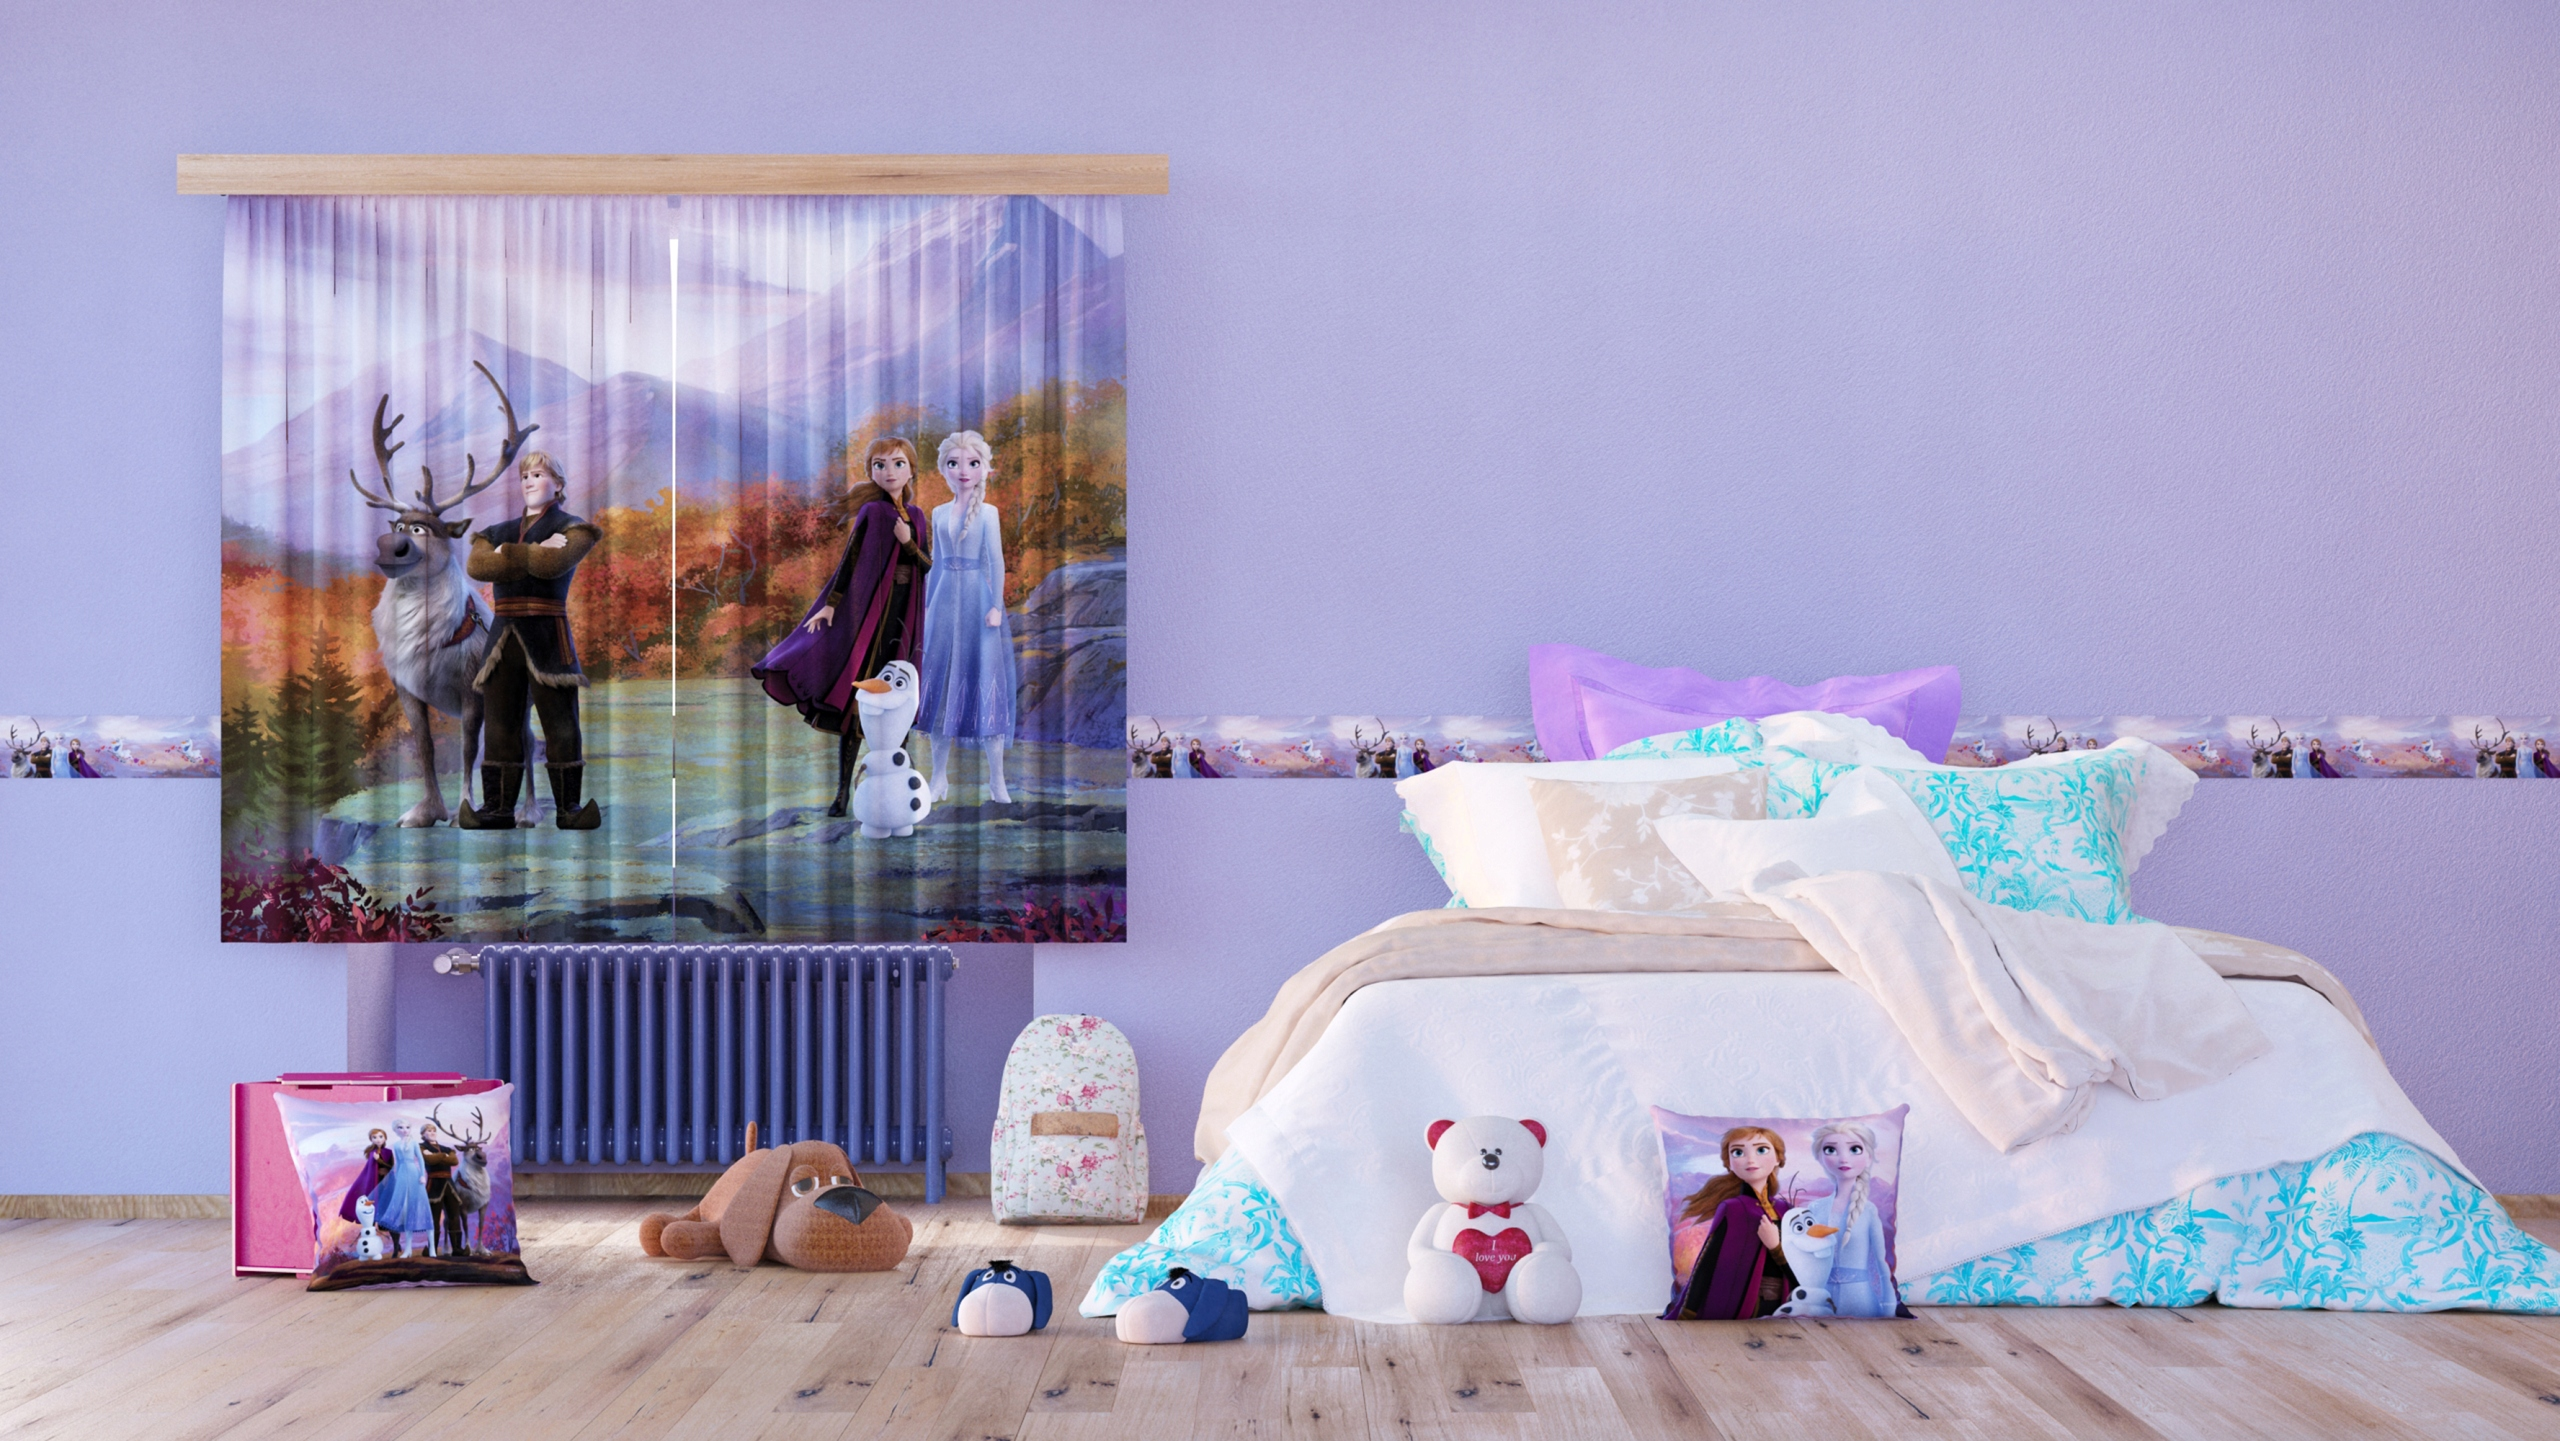 Záves Disney Frozen 2, dizajn 180 x 260 -AG